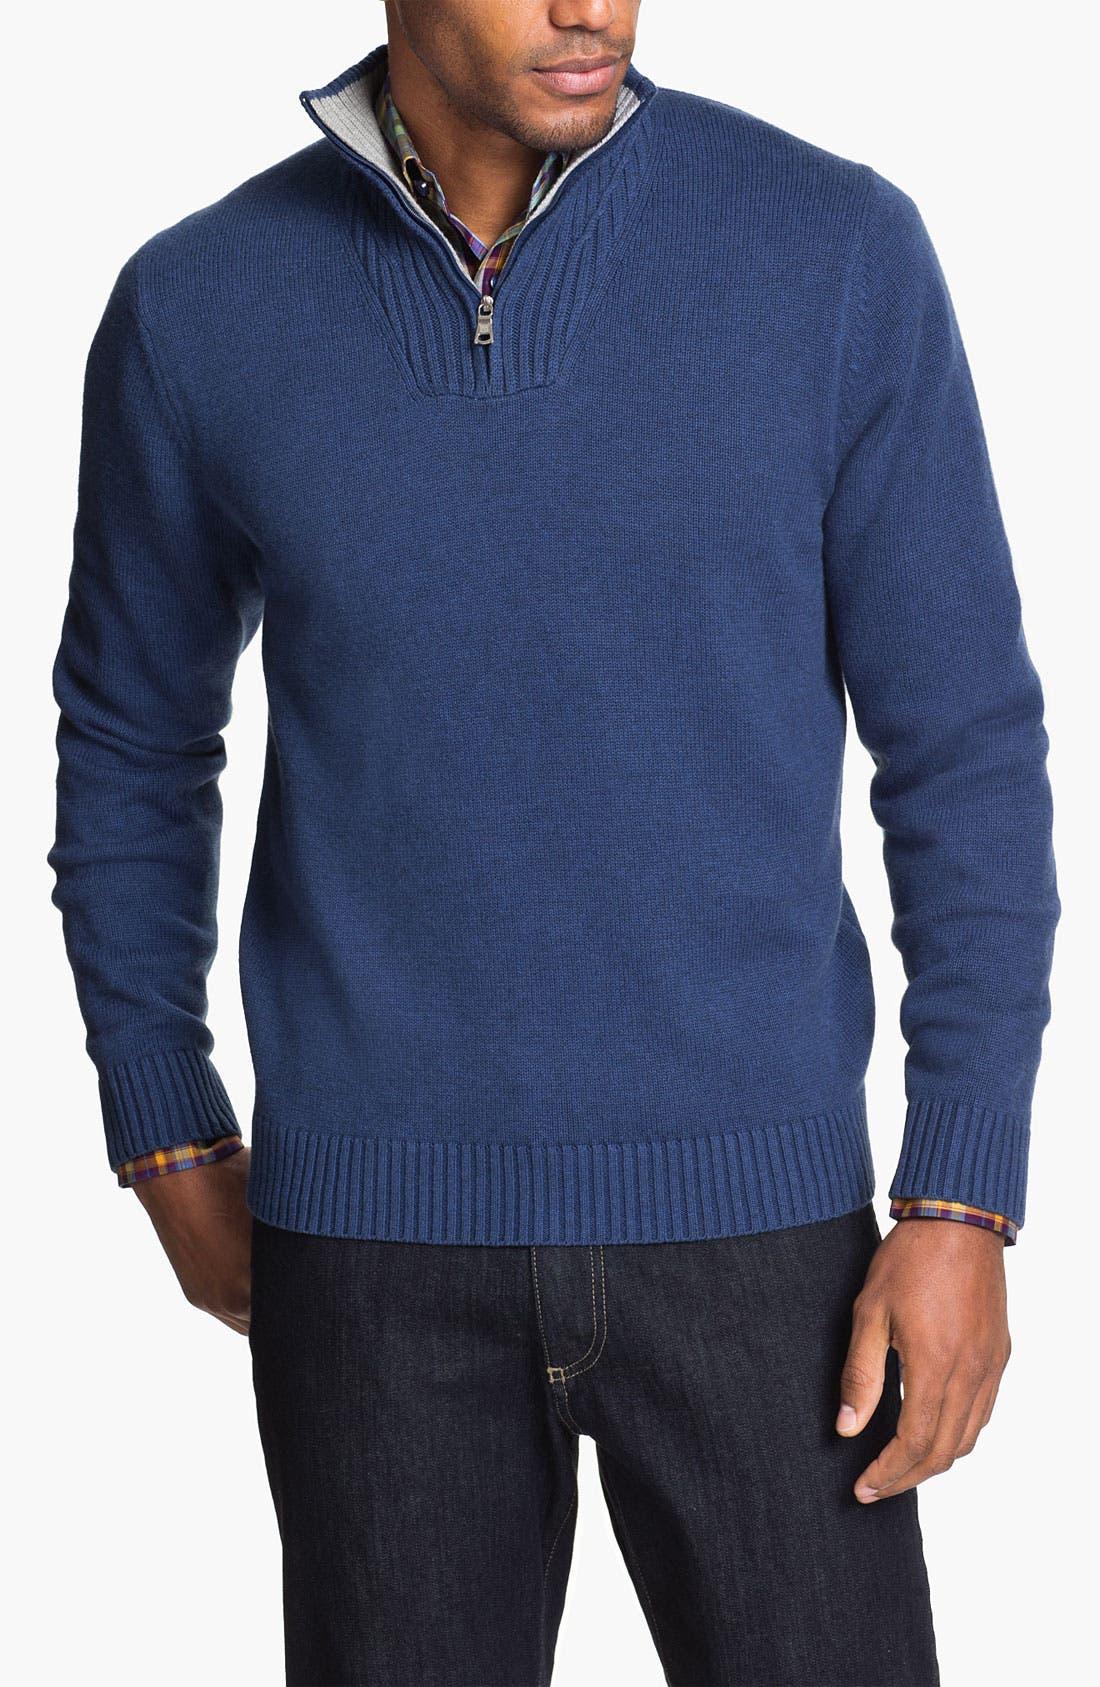 Alternate Image 1 Selected - Robert Talbott Half Zip Cotton & Cashmere Sweater